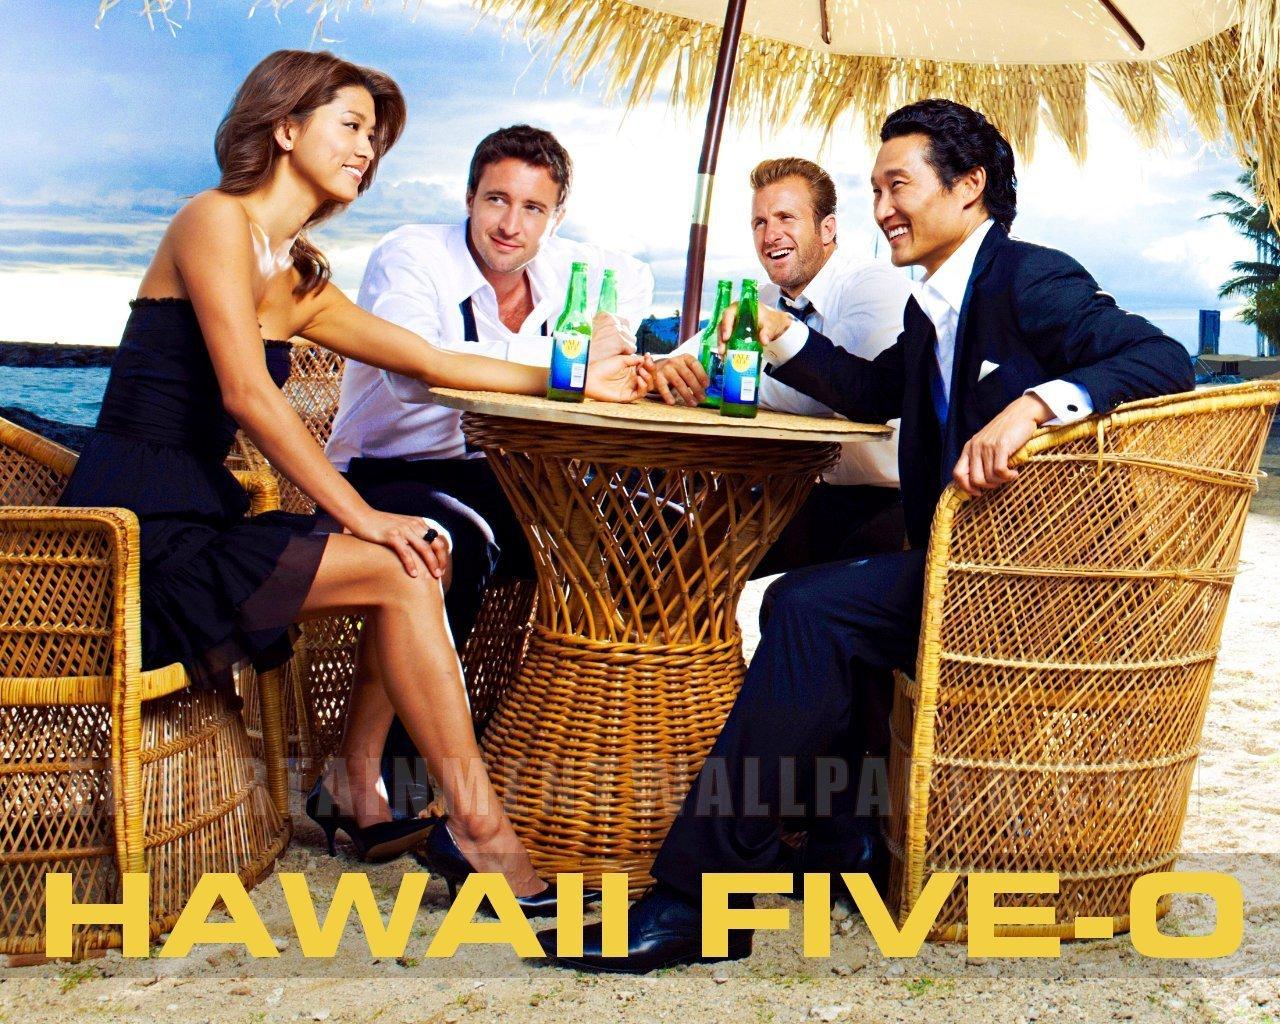 Hawaii Five O Wallpaper: Hawaii Five-0 (2010) Wallpaper (20909253